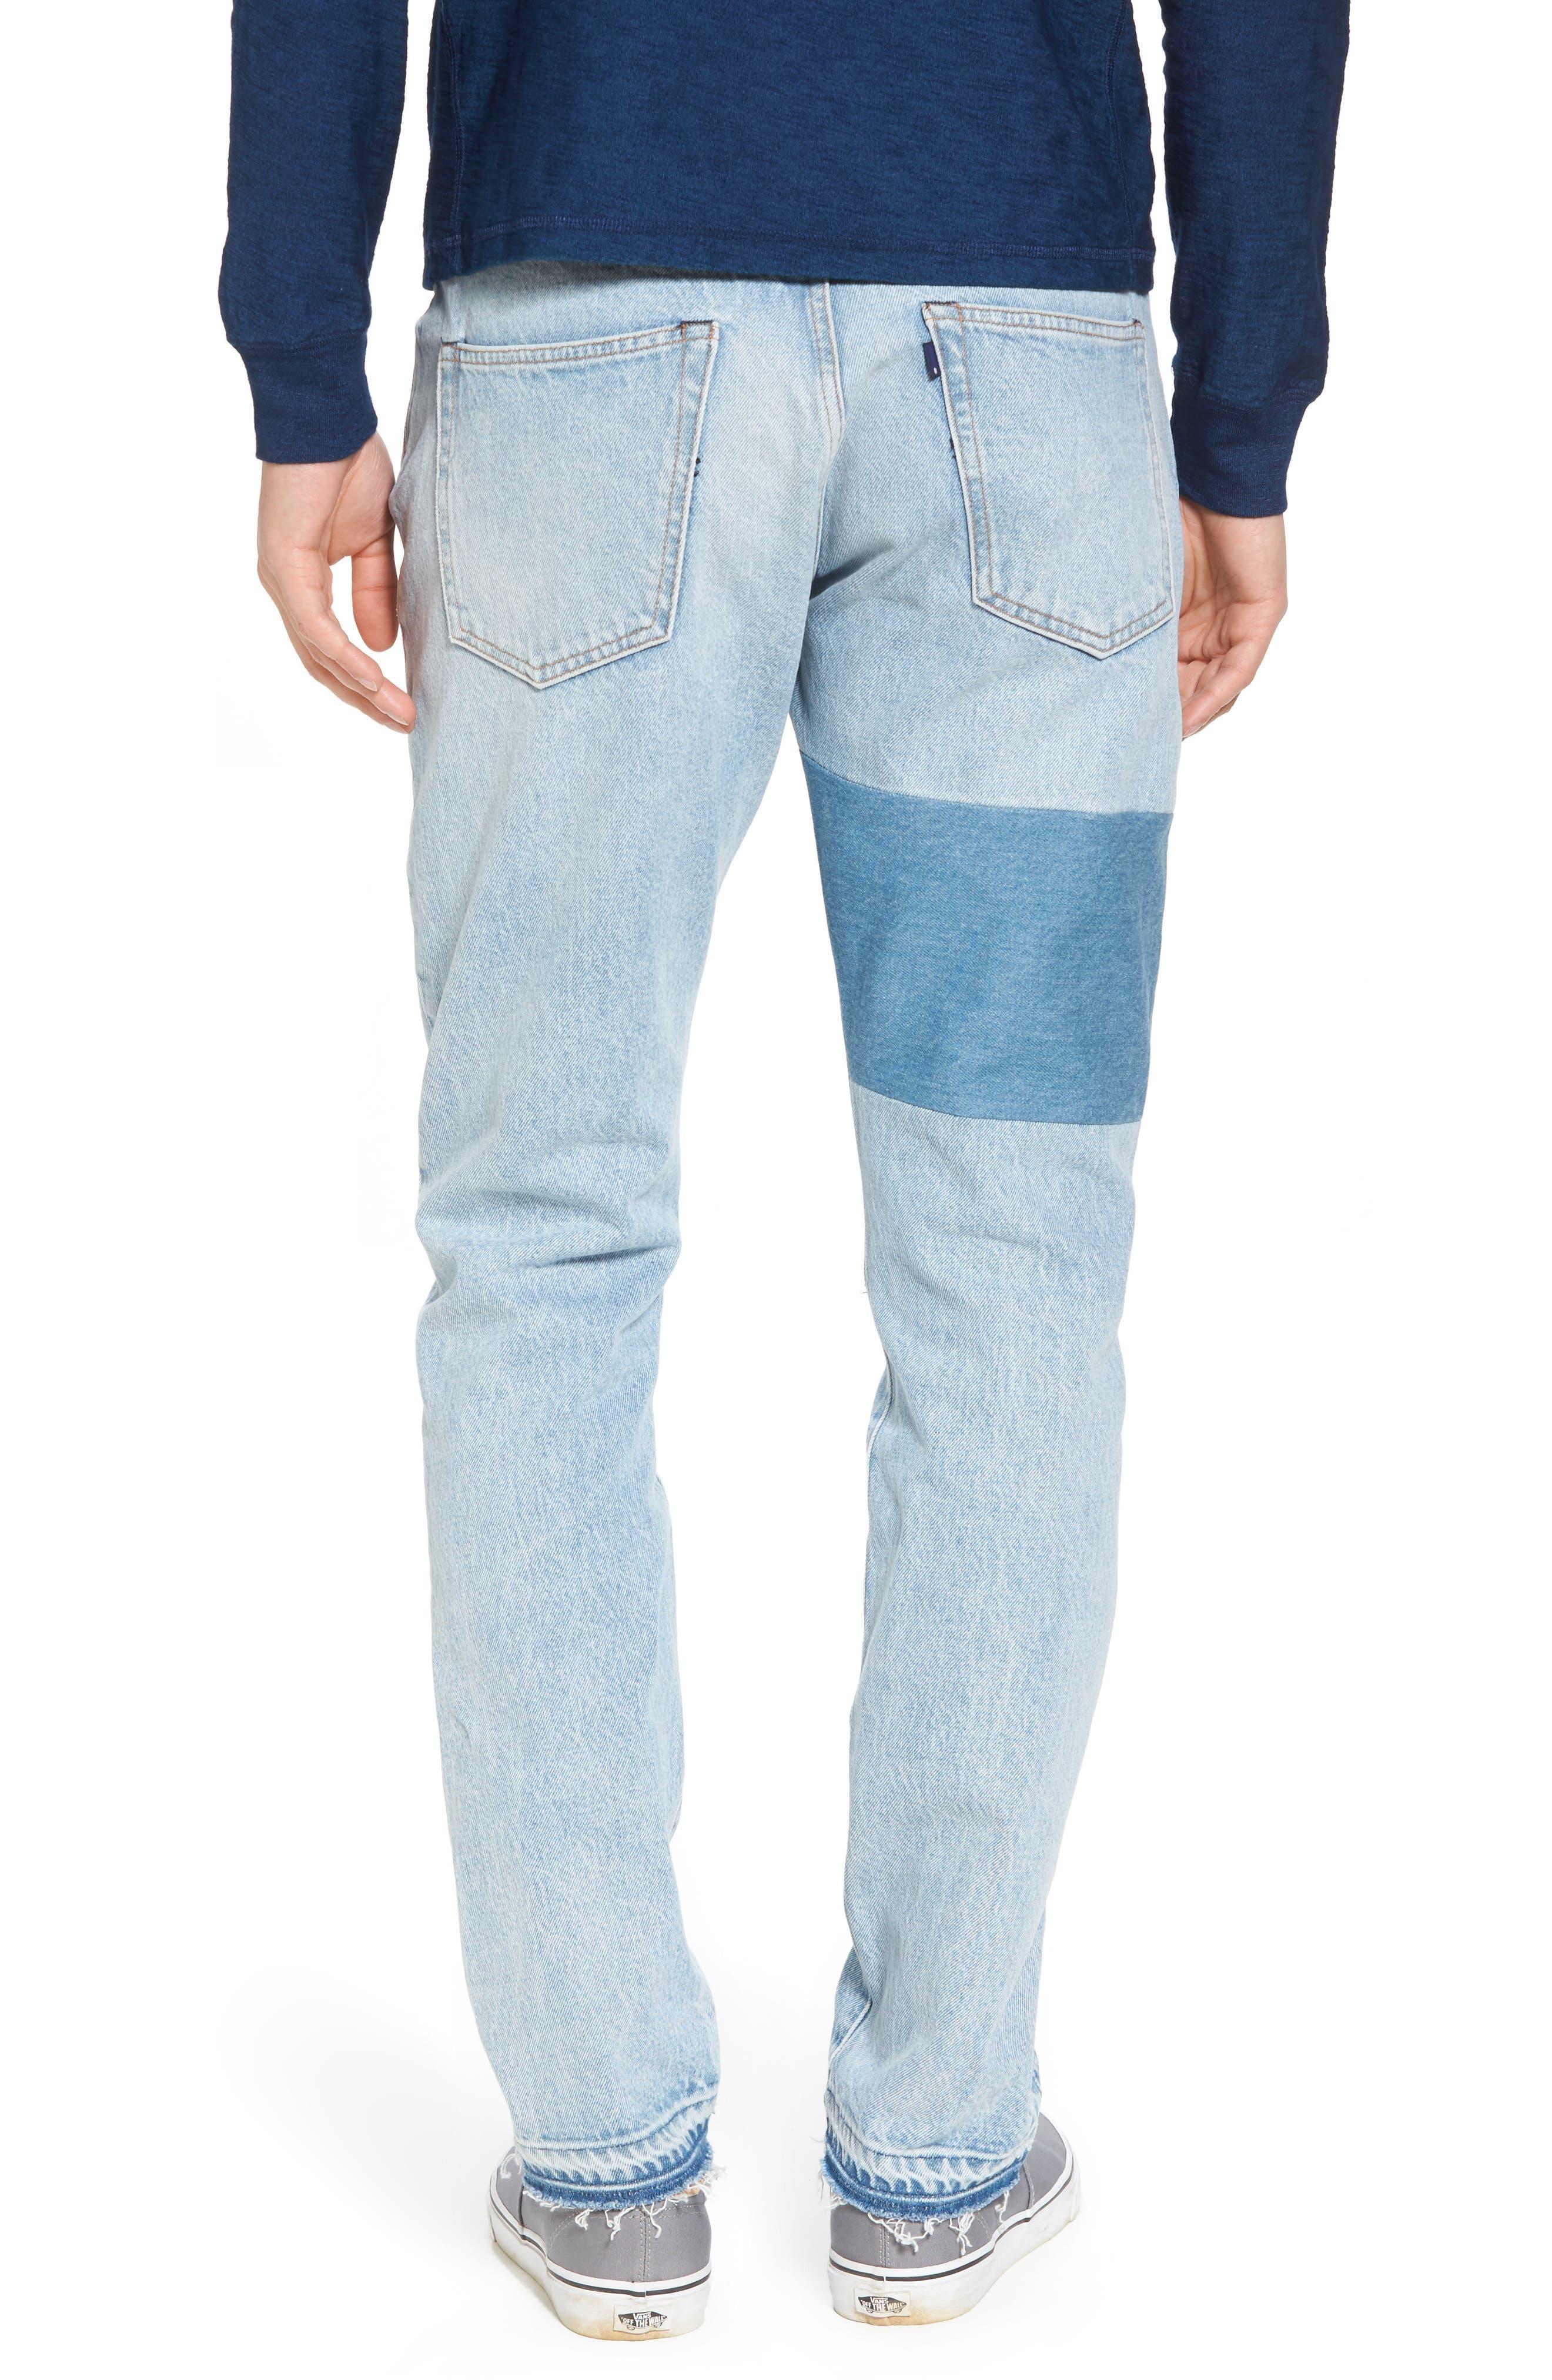 Studio Slim Fit Jeans,                             Alternate thumbnail 2, color,